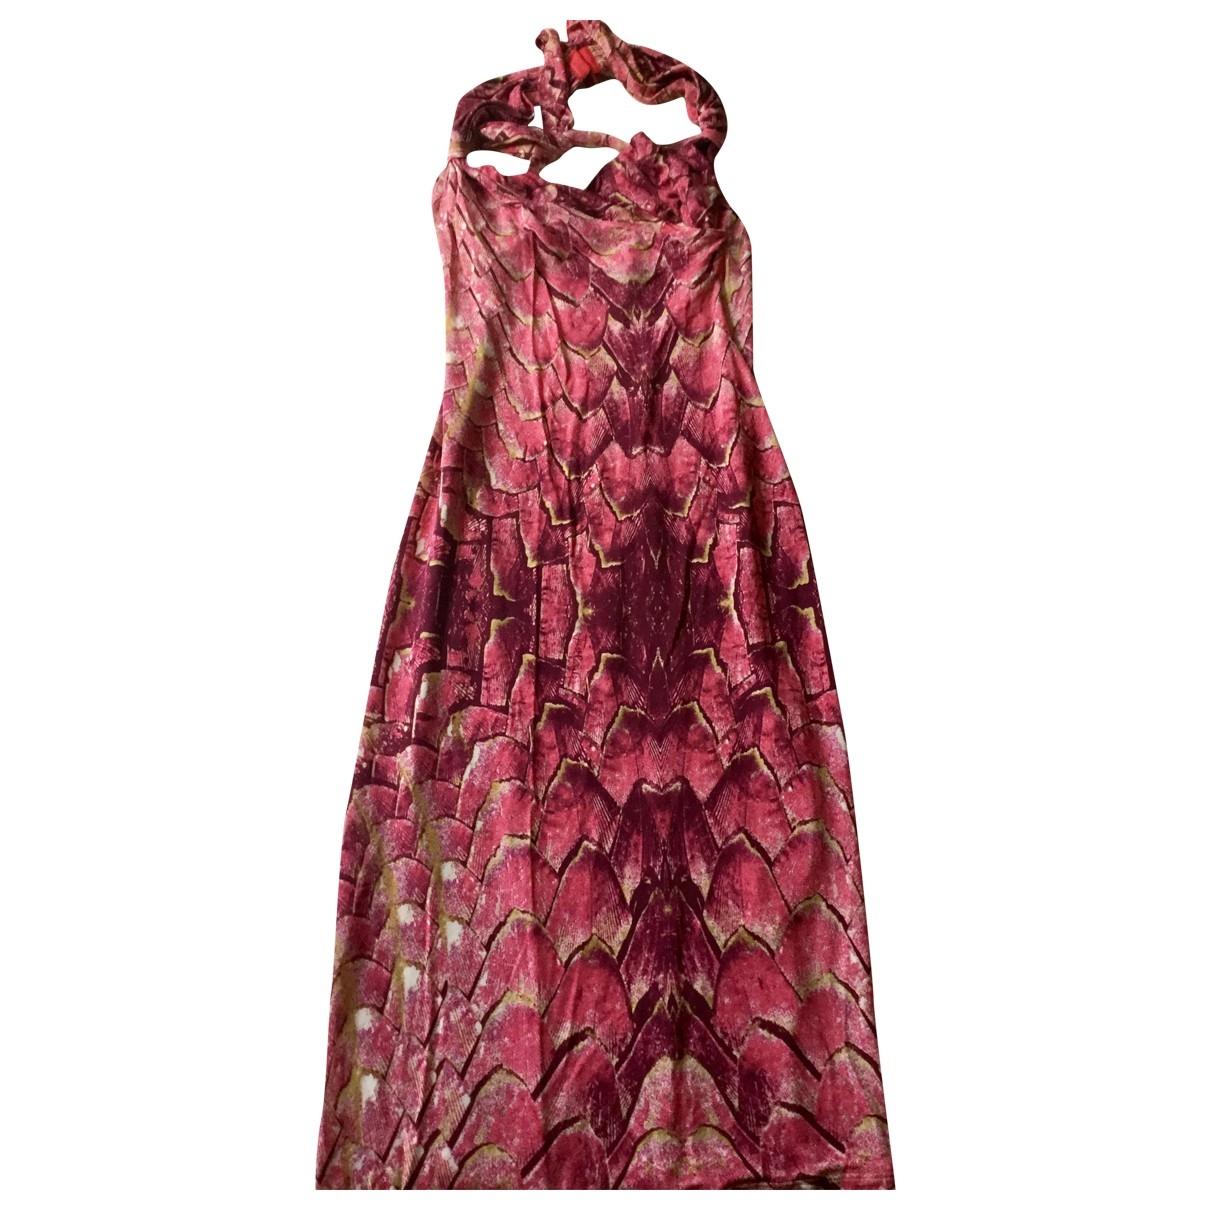 Just Cavalli \N Pink dress for Women 42 IT